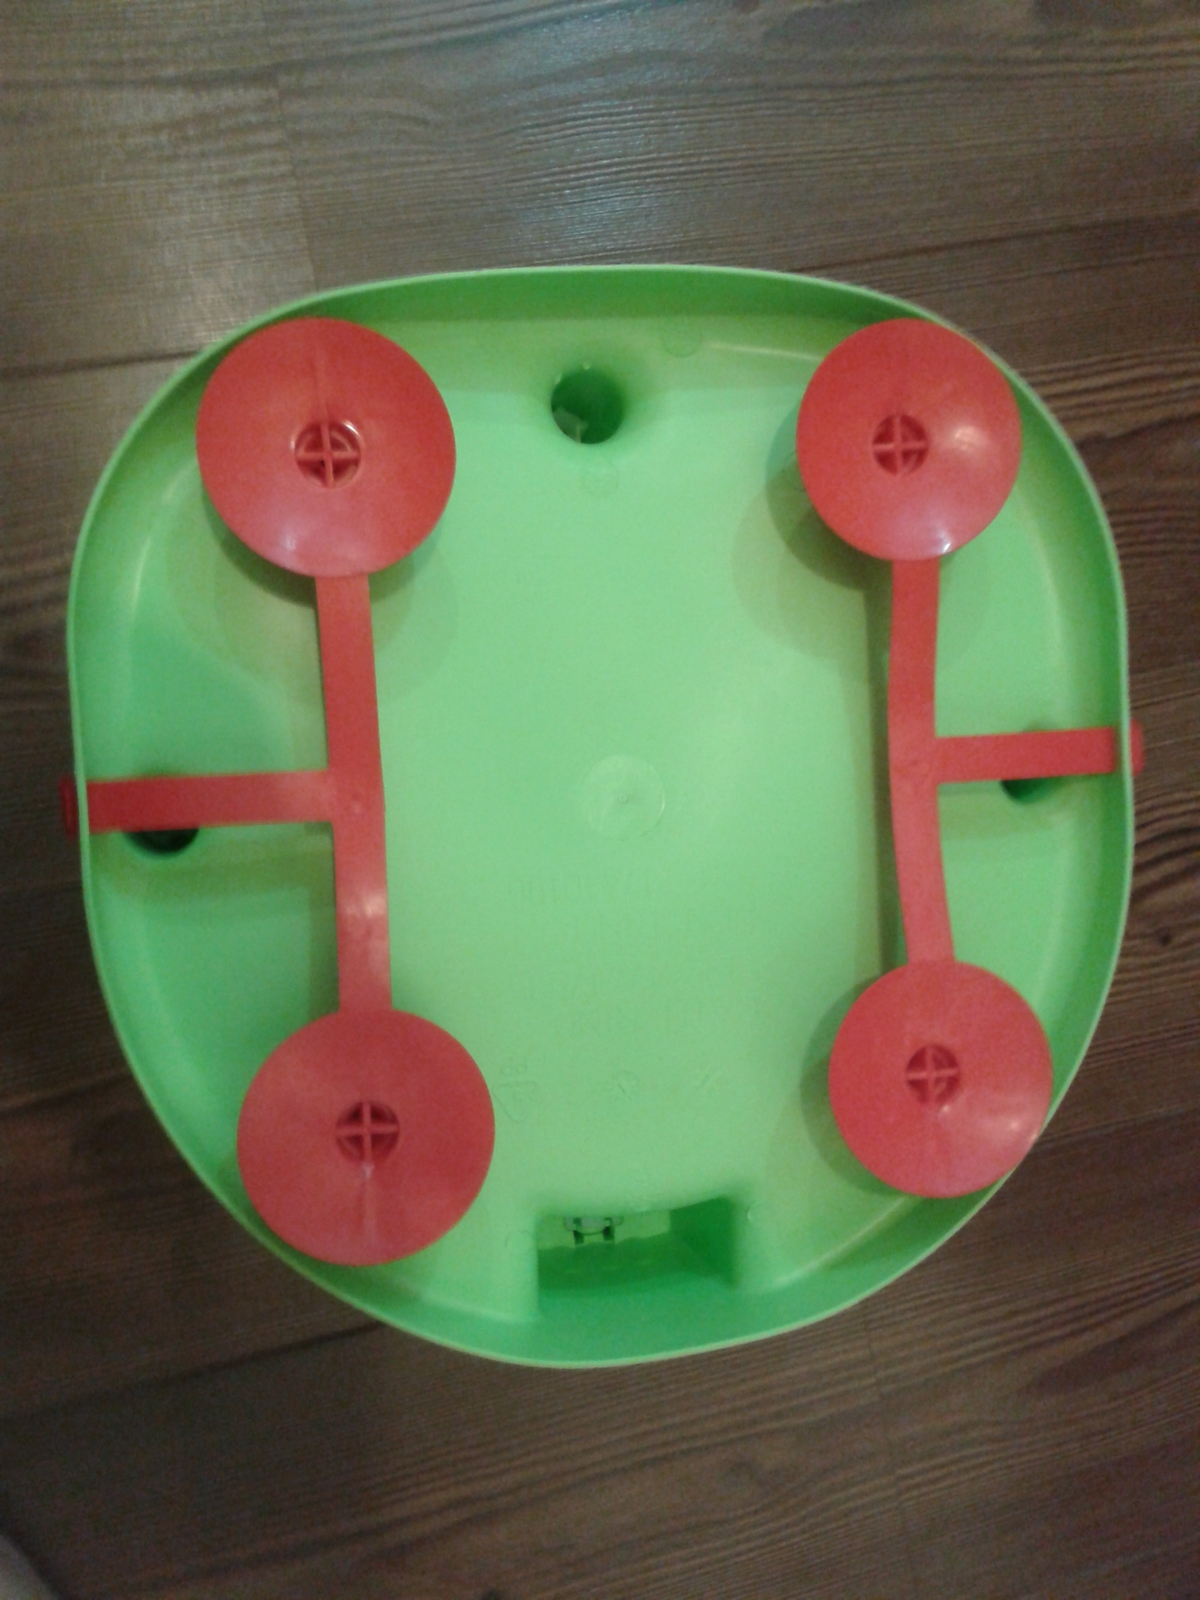 baby bath tub ring seat keter new bath tub seats rings. Black Bedroom Furniture Sets. Home Design Ideas